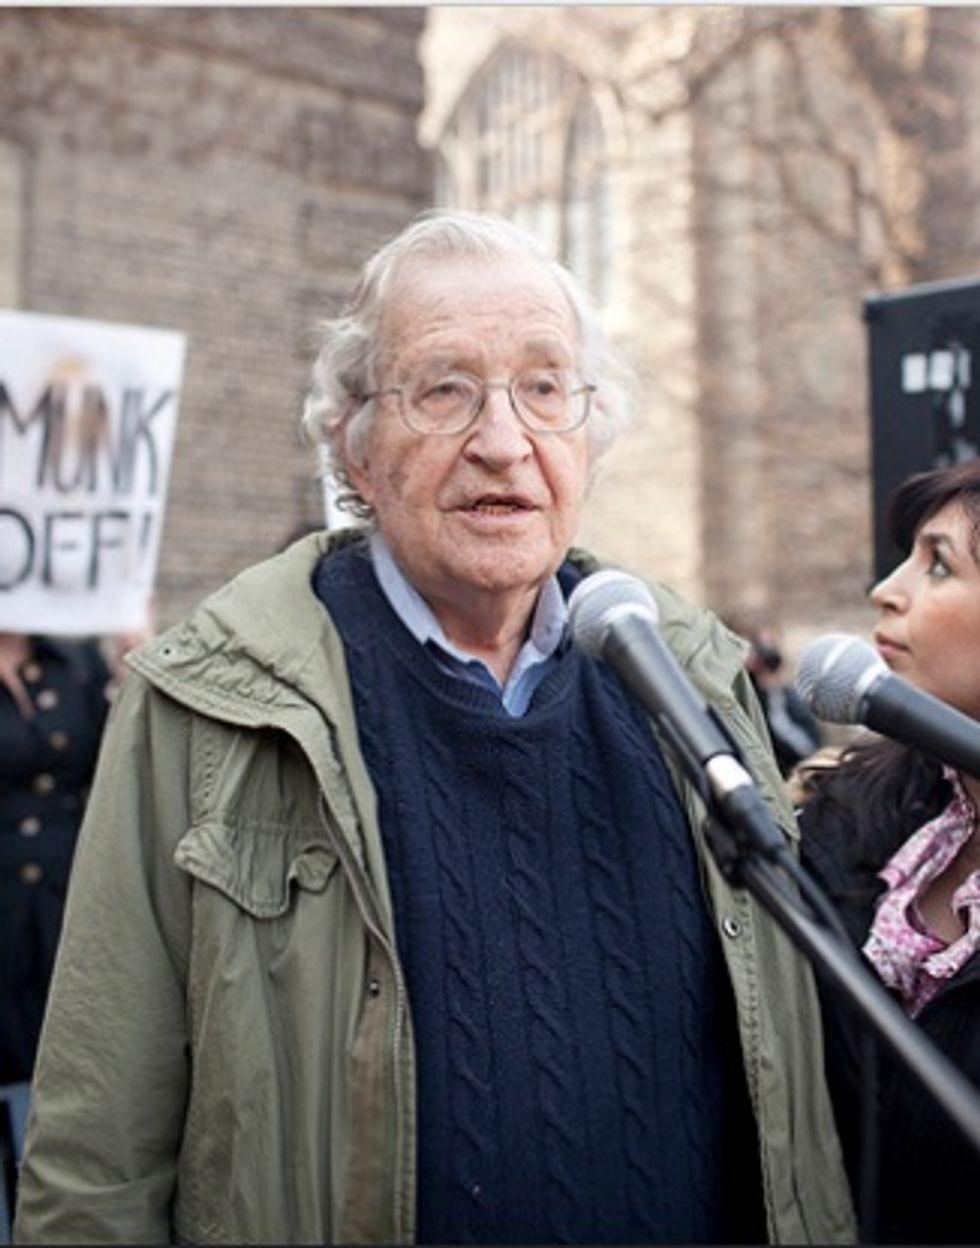 Noam Chomsky destroys 'criminally insane' Trump administration